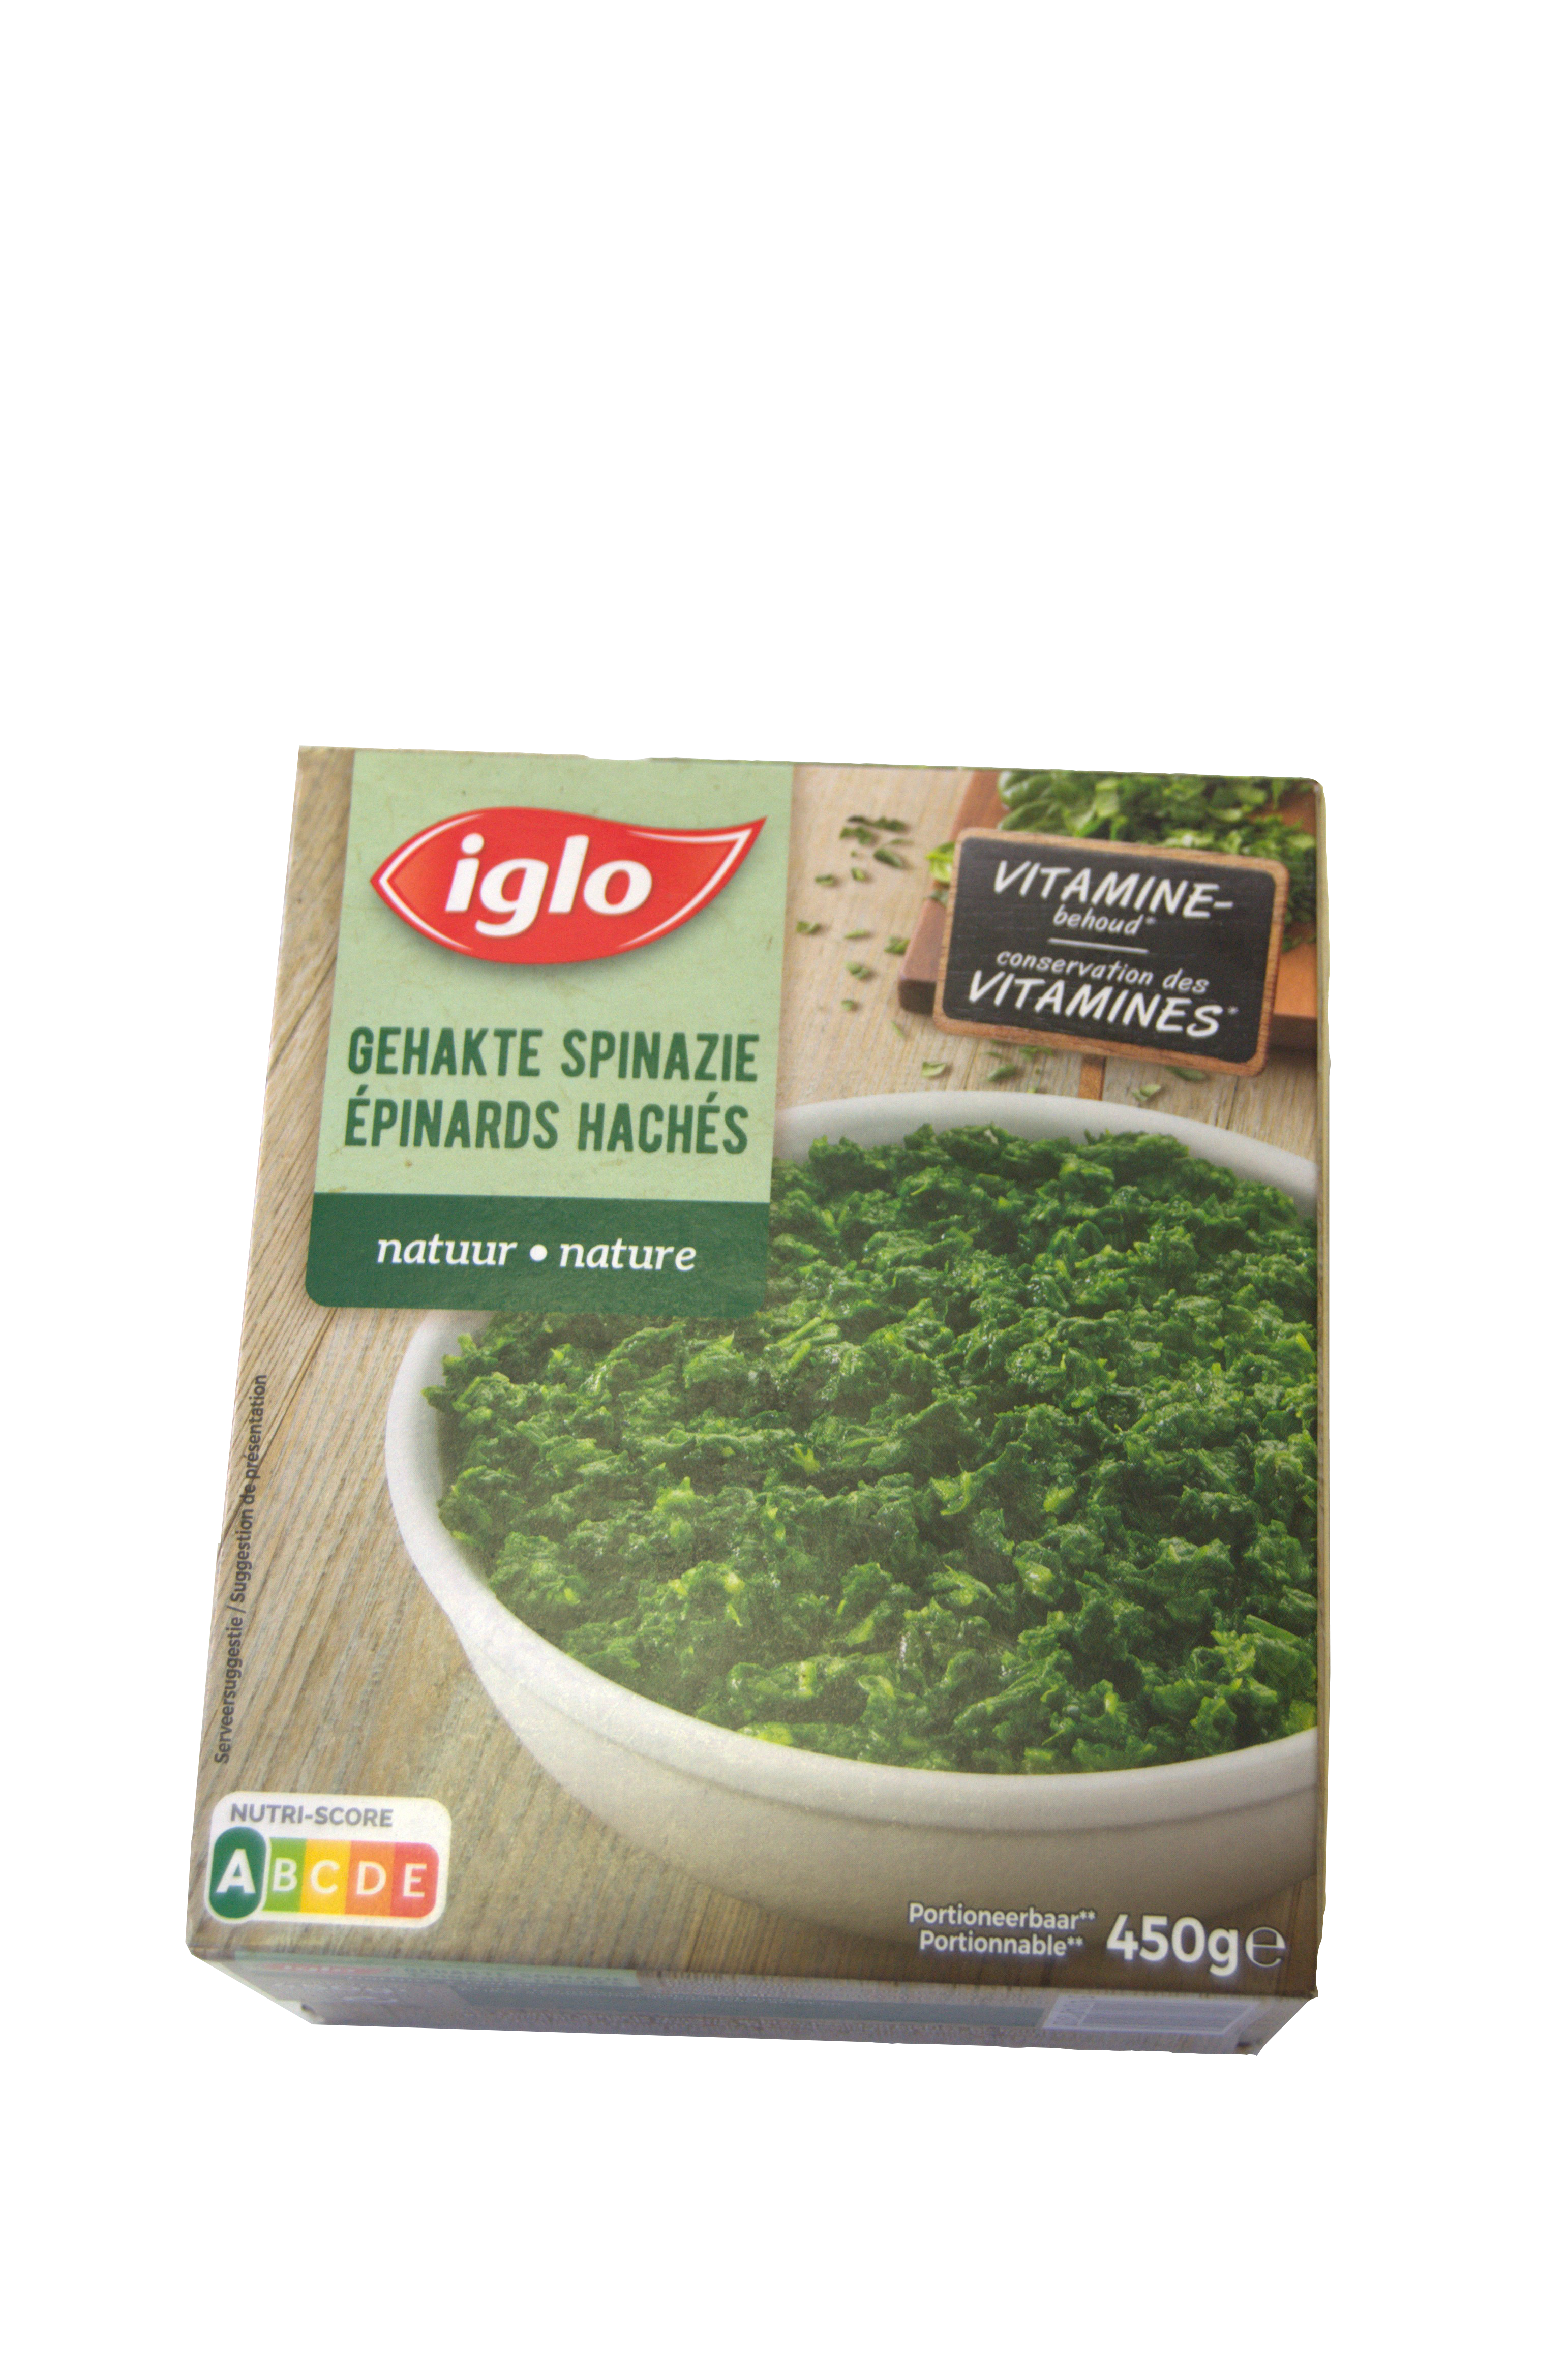 iglo gehakte spinazie natuur